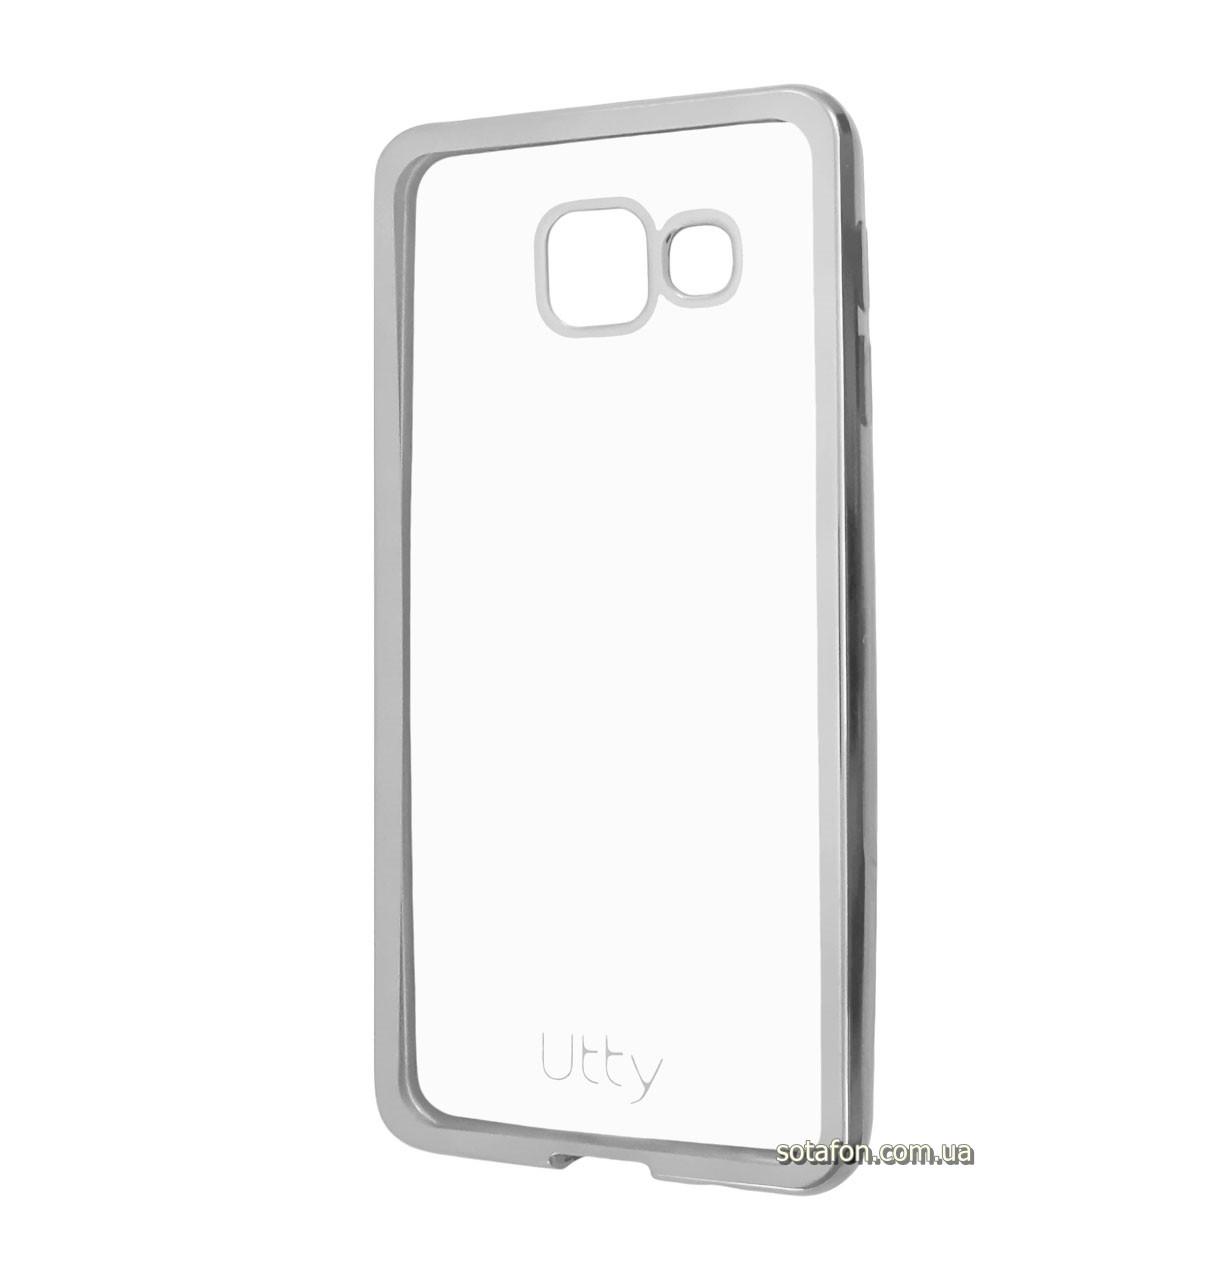 Силиконовый чехол Utty Electroplating TPU на Samsung Galaxy A3 (2016) SM-A310F Silver